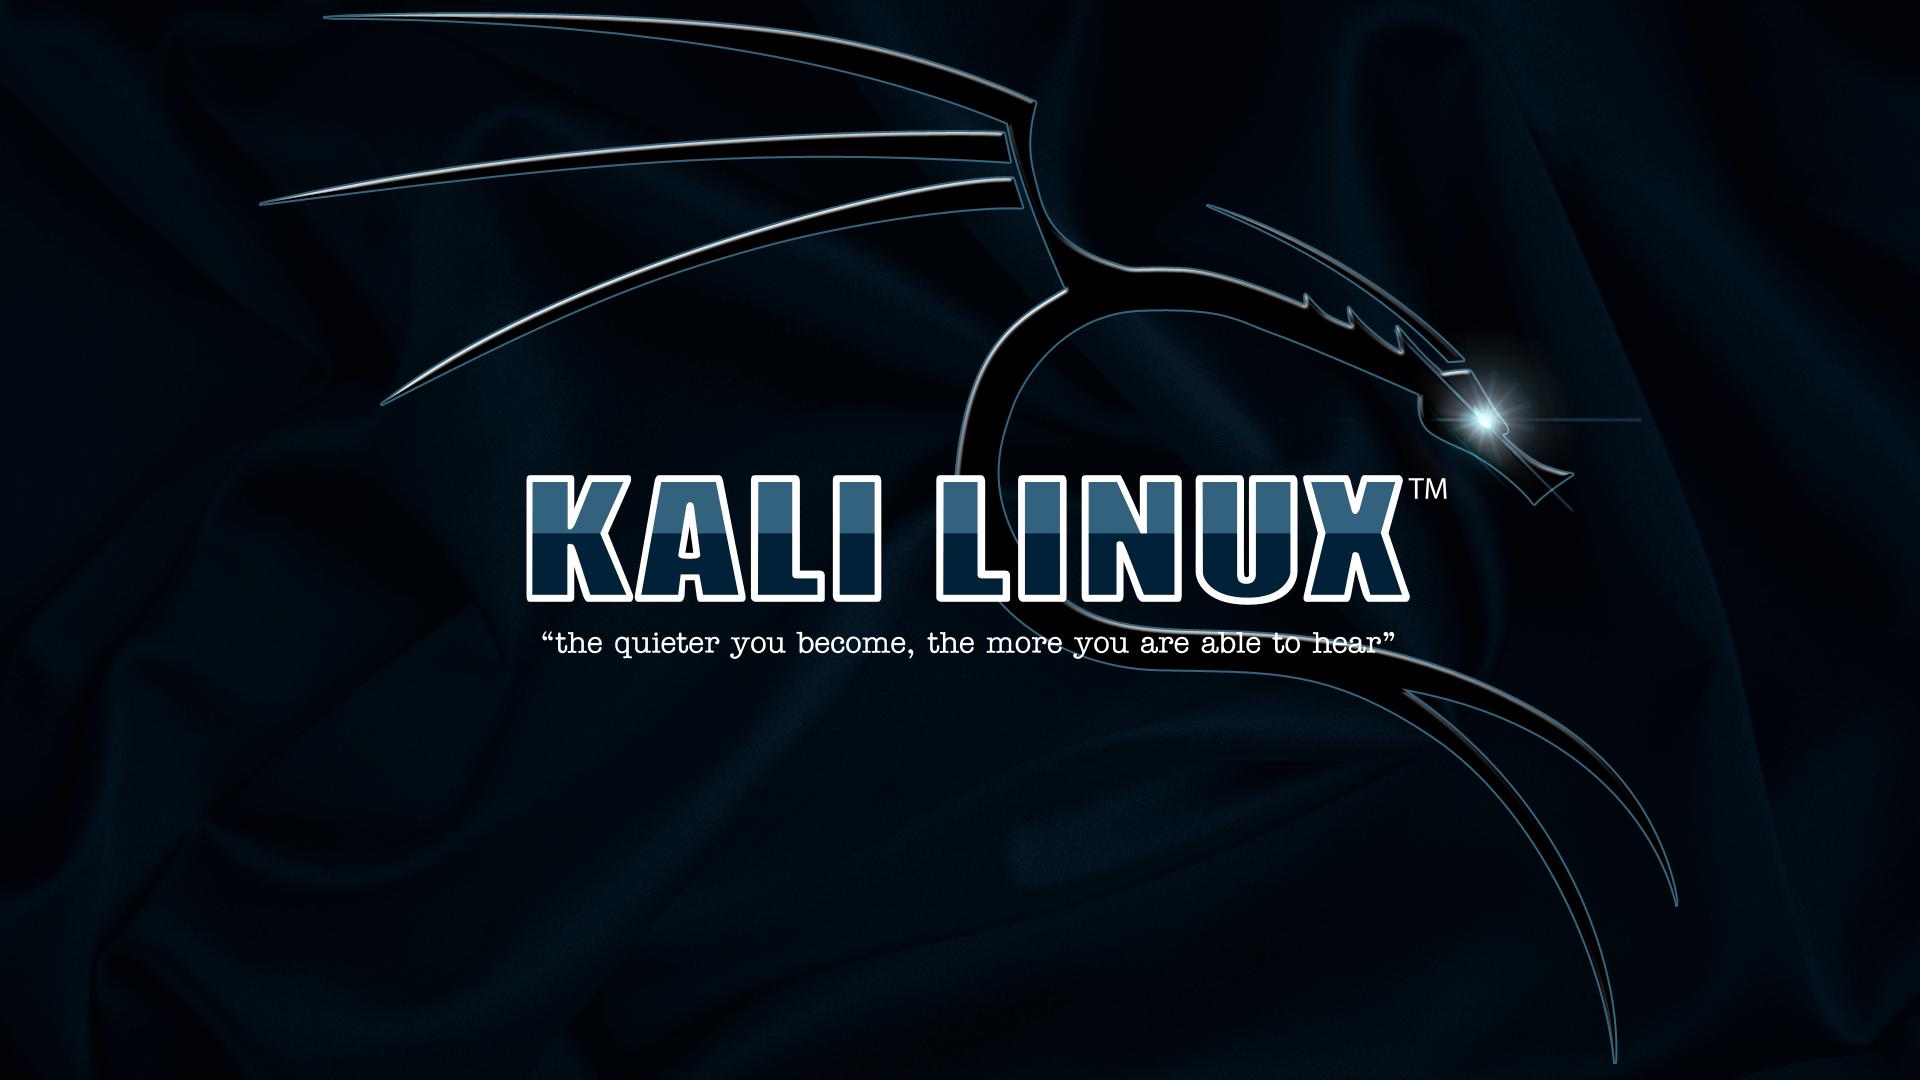 Kali Linux Wallpapers Kali Linux Wajah Teknologi Seni